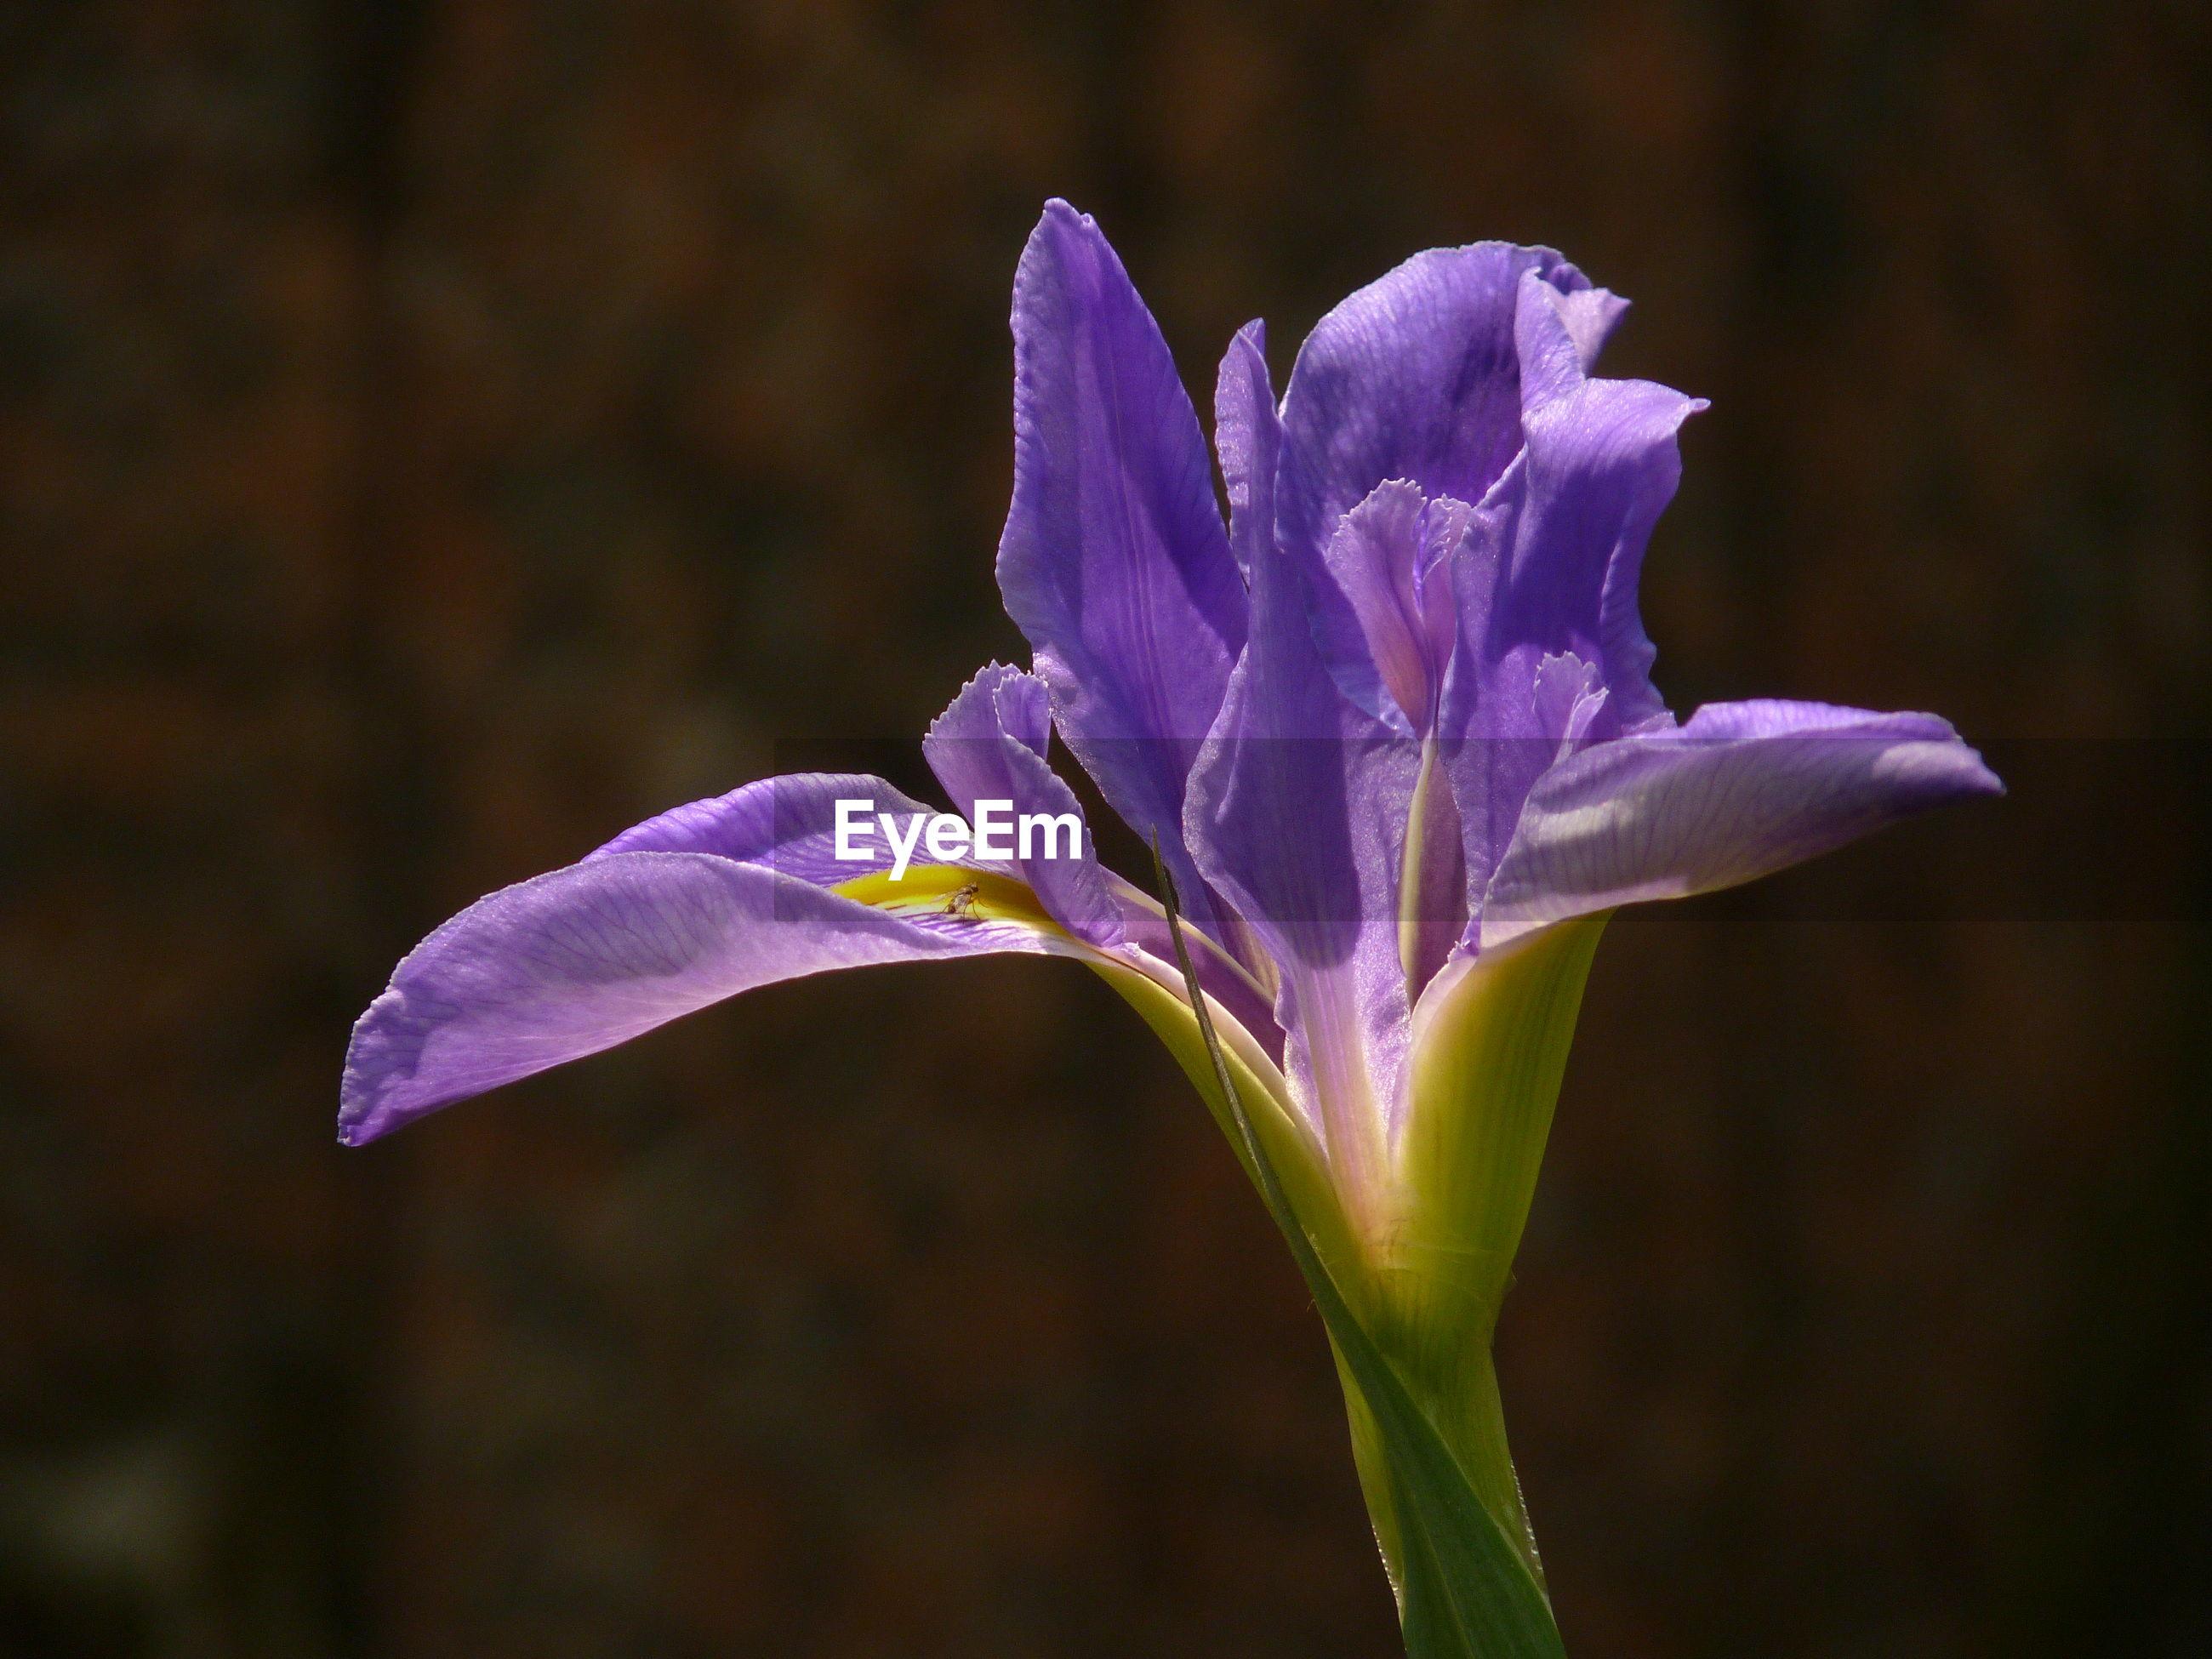 CLOSE-UP OF FRESH PURPLE IRIS FLOWER